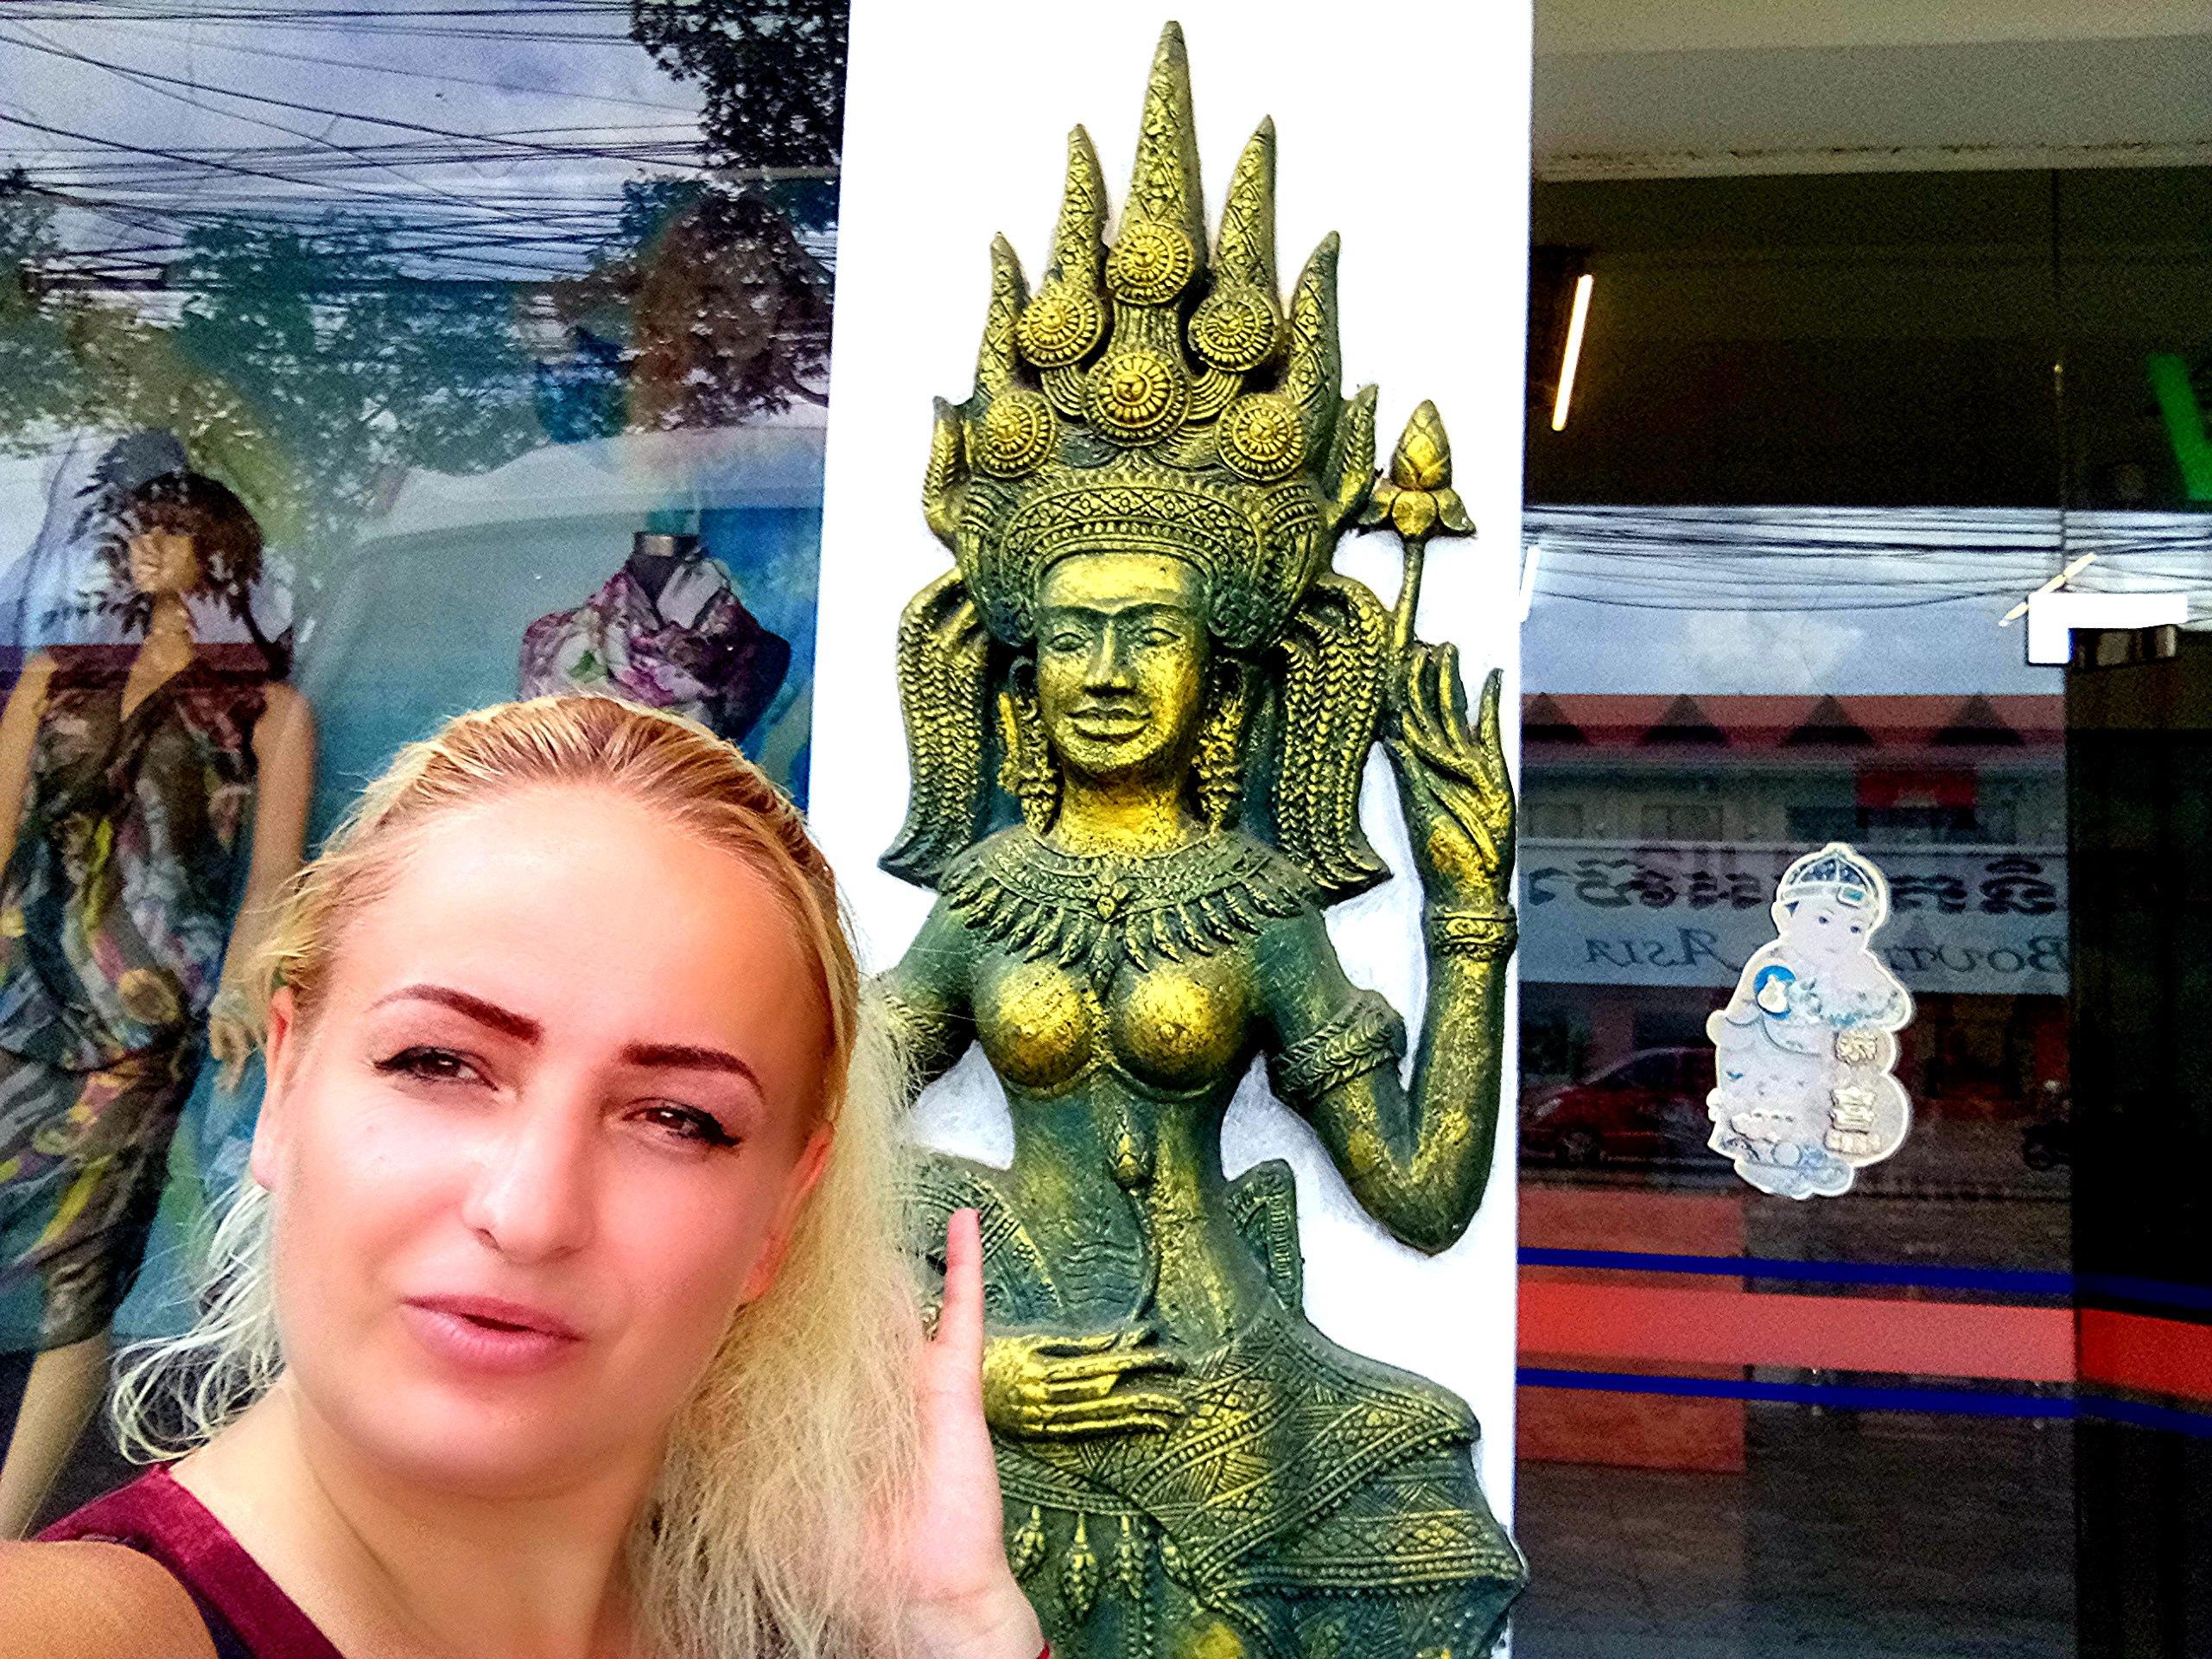 travel - Елена Руденко (Валтея). Камбоджа. Сием Рип. GjOatSN5gPo